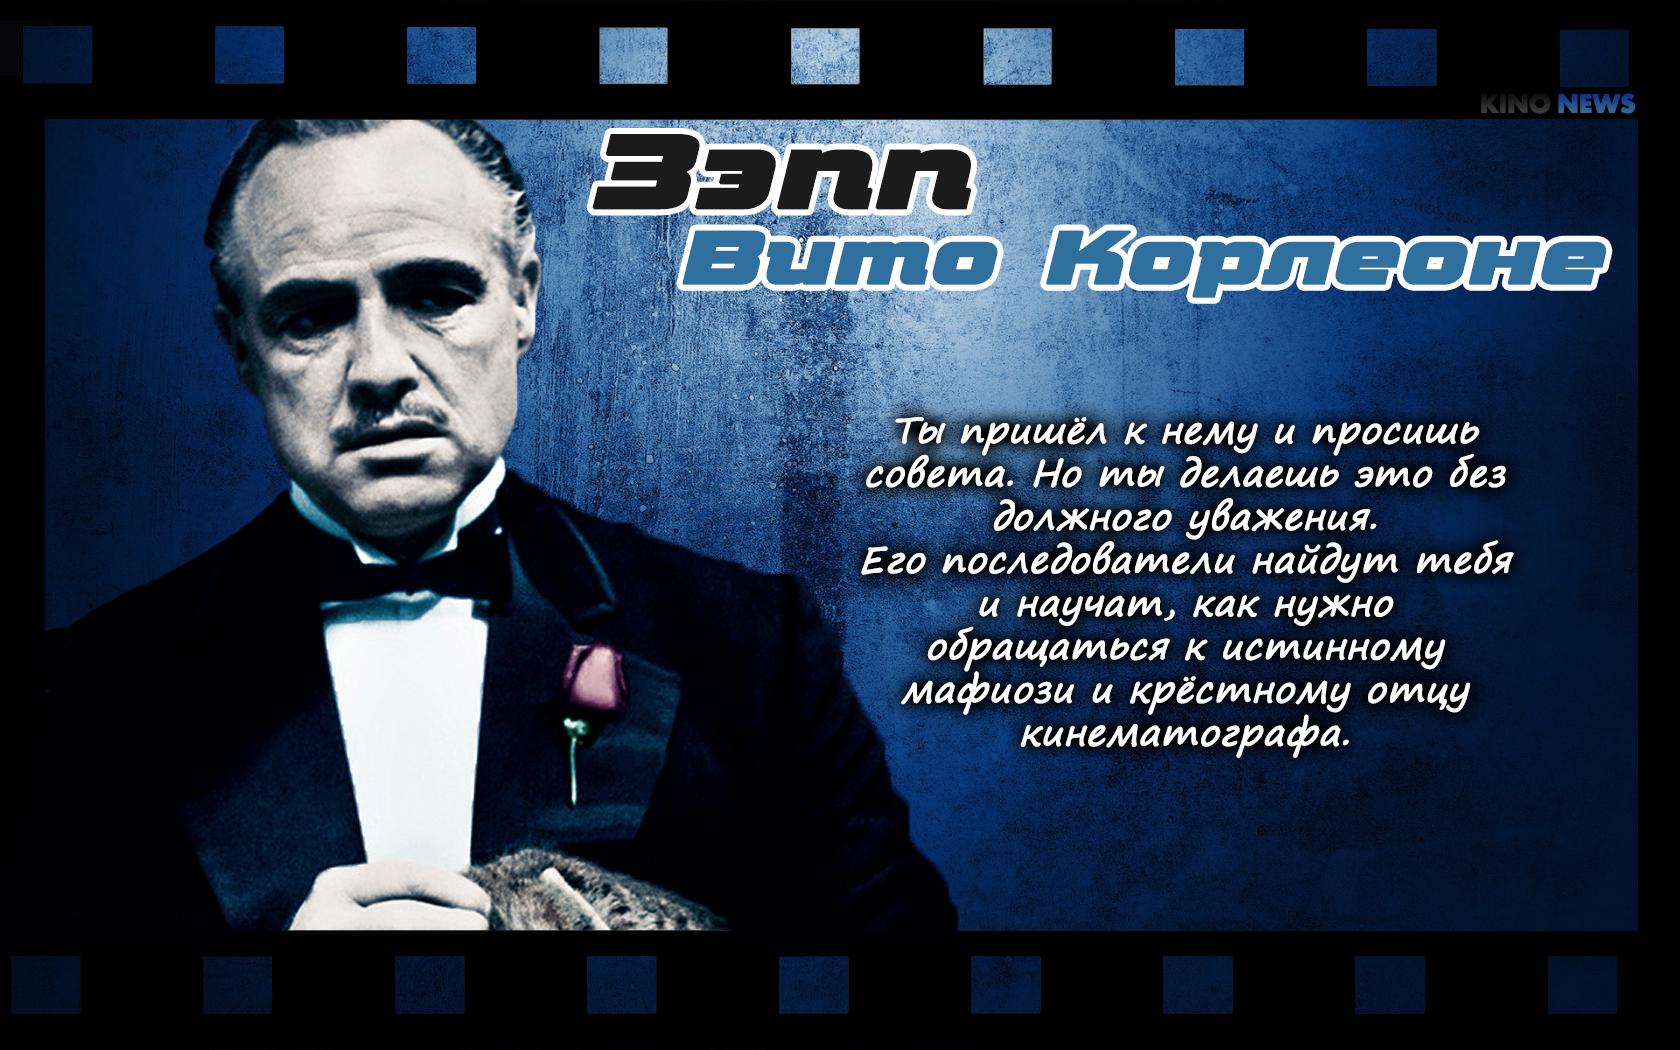 https://www.kinonews.ru/insimgs/2017/persimg/persimg77944_61.jpg